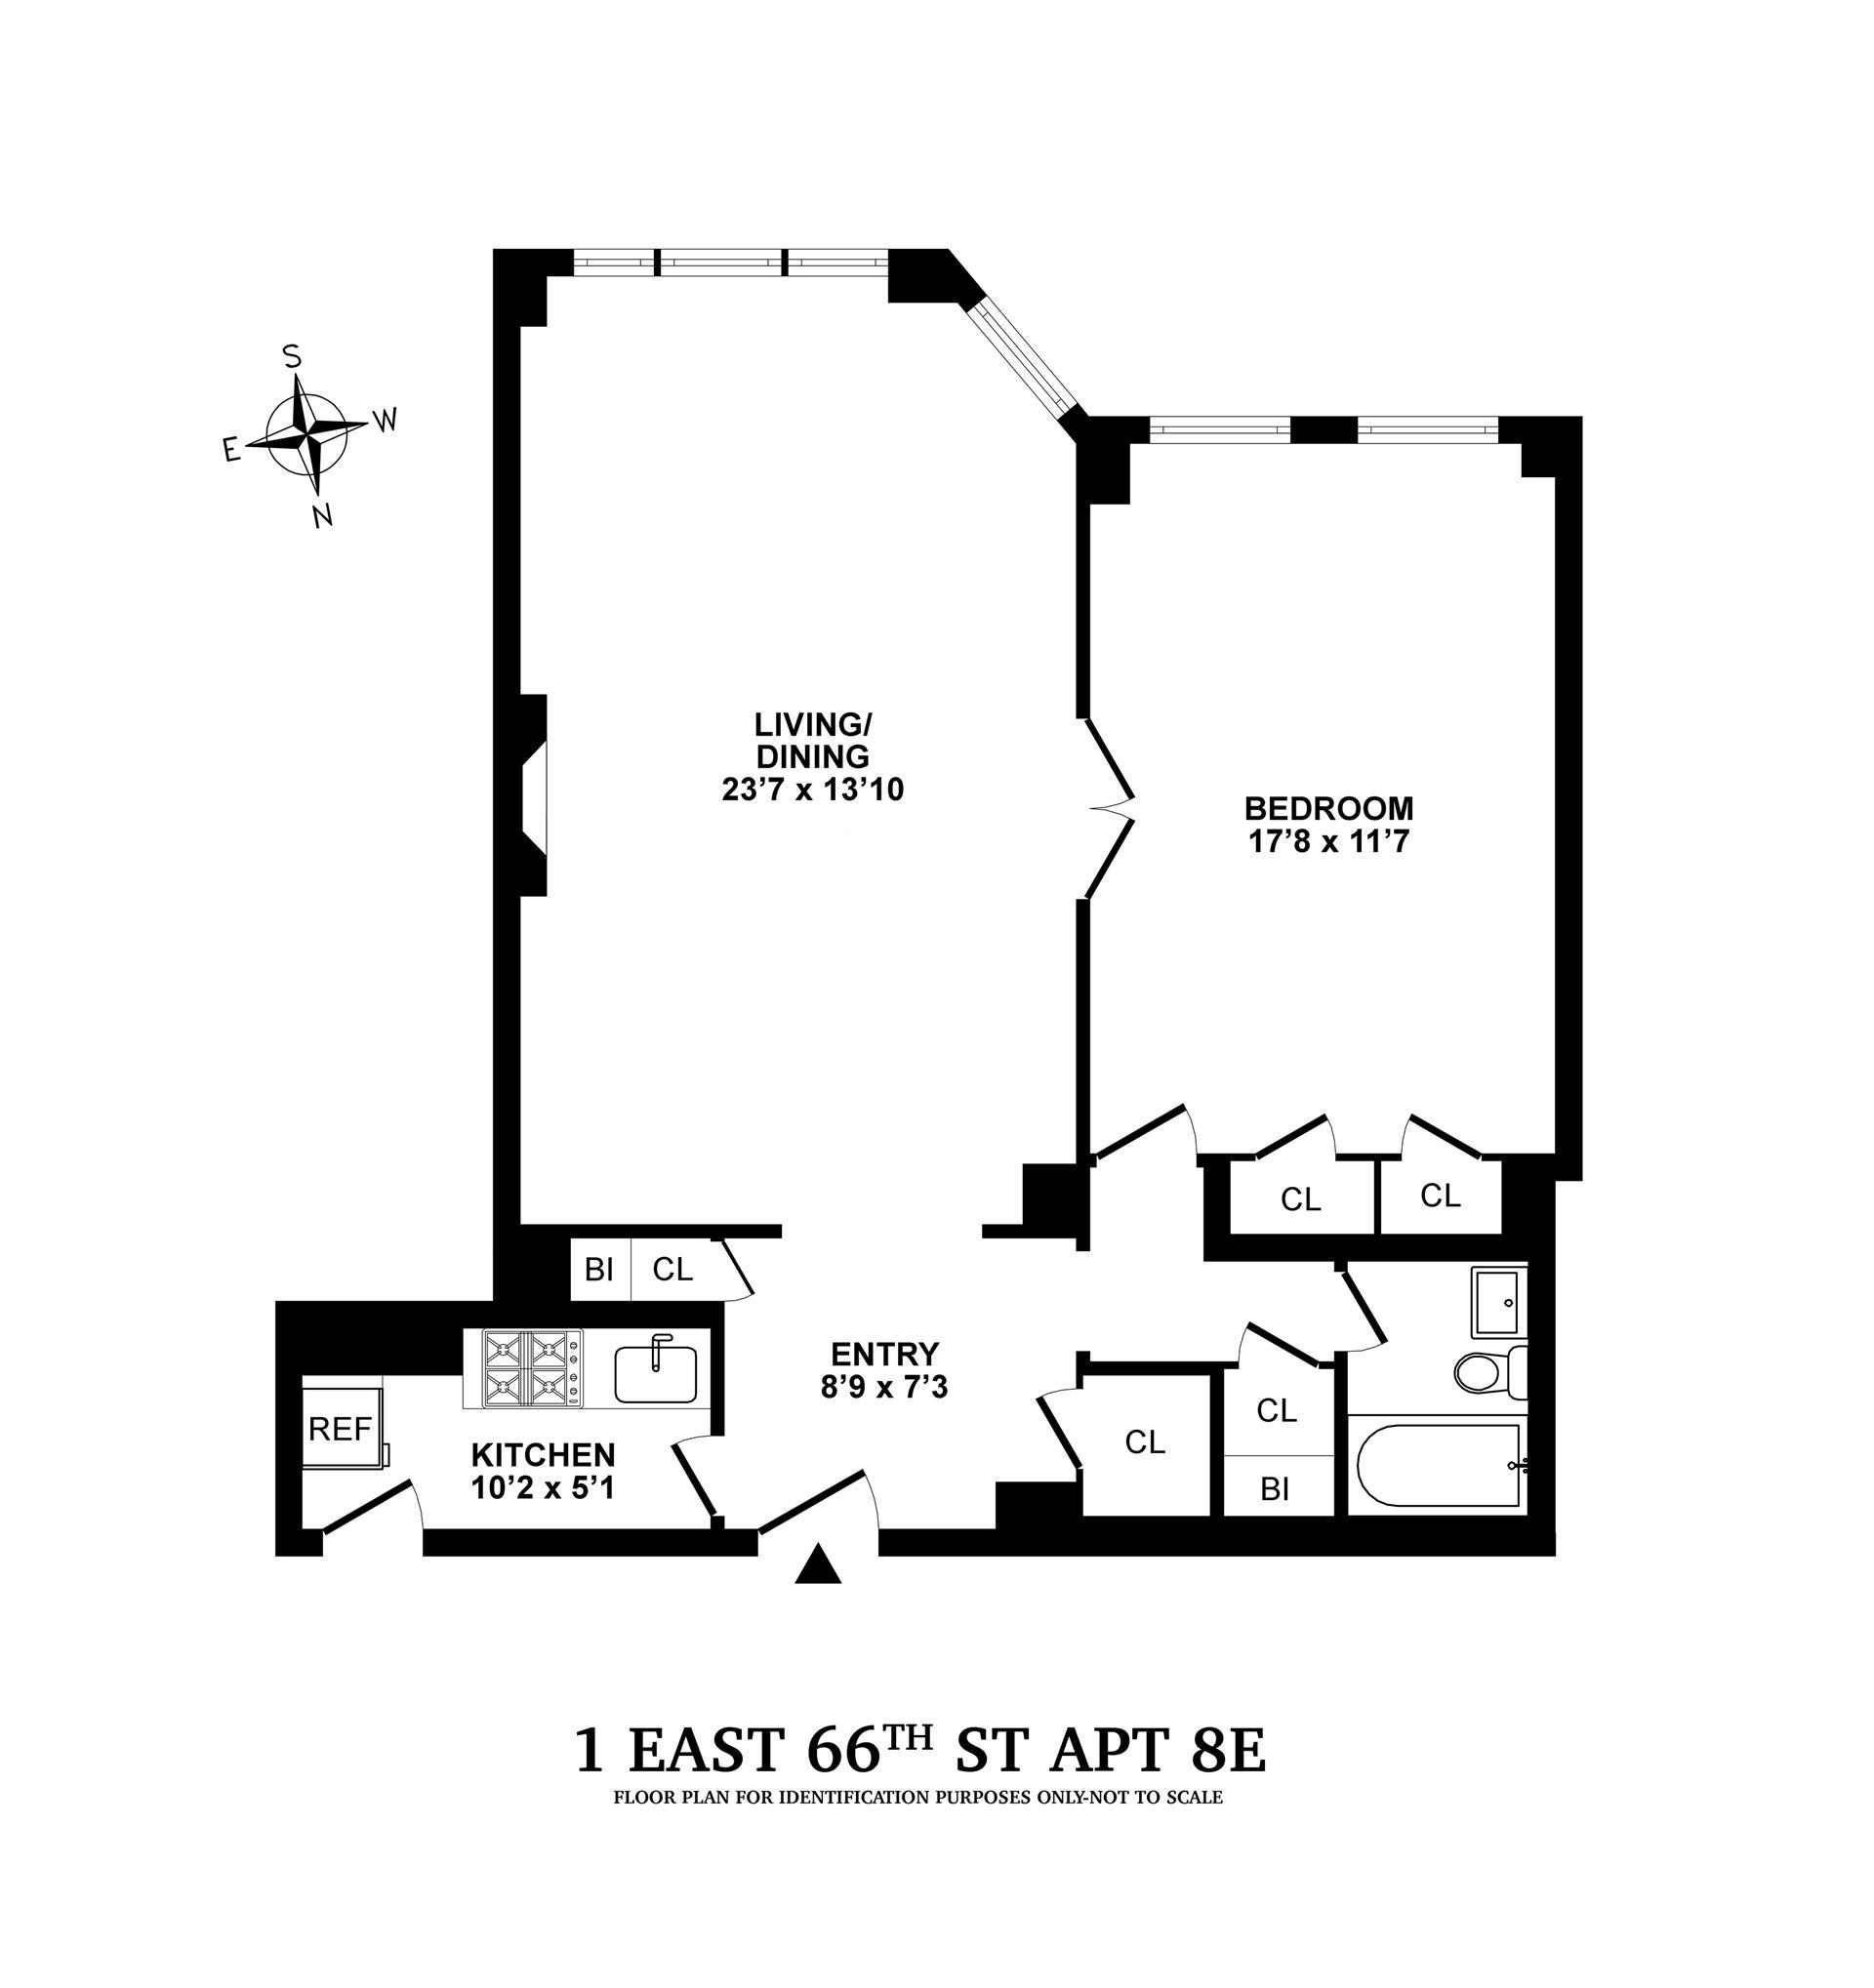 Floor plan of 1 East 66th Street Corp., 1 East 66th St, 8E - Upper East Side, New York